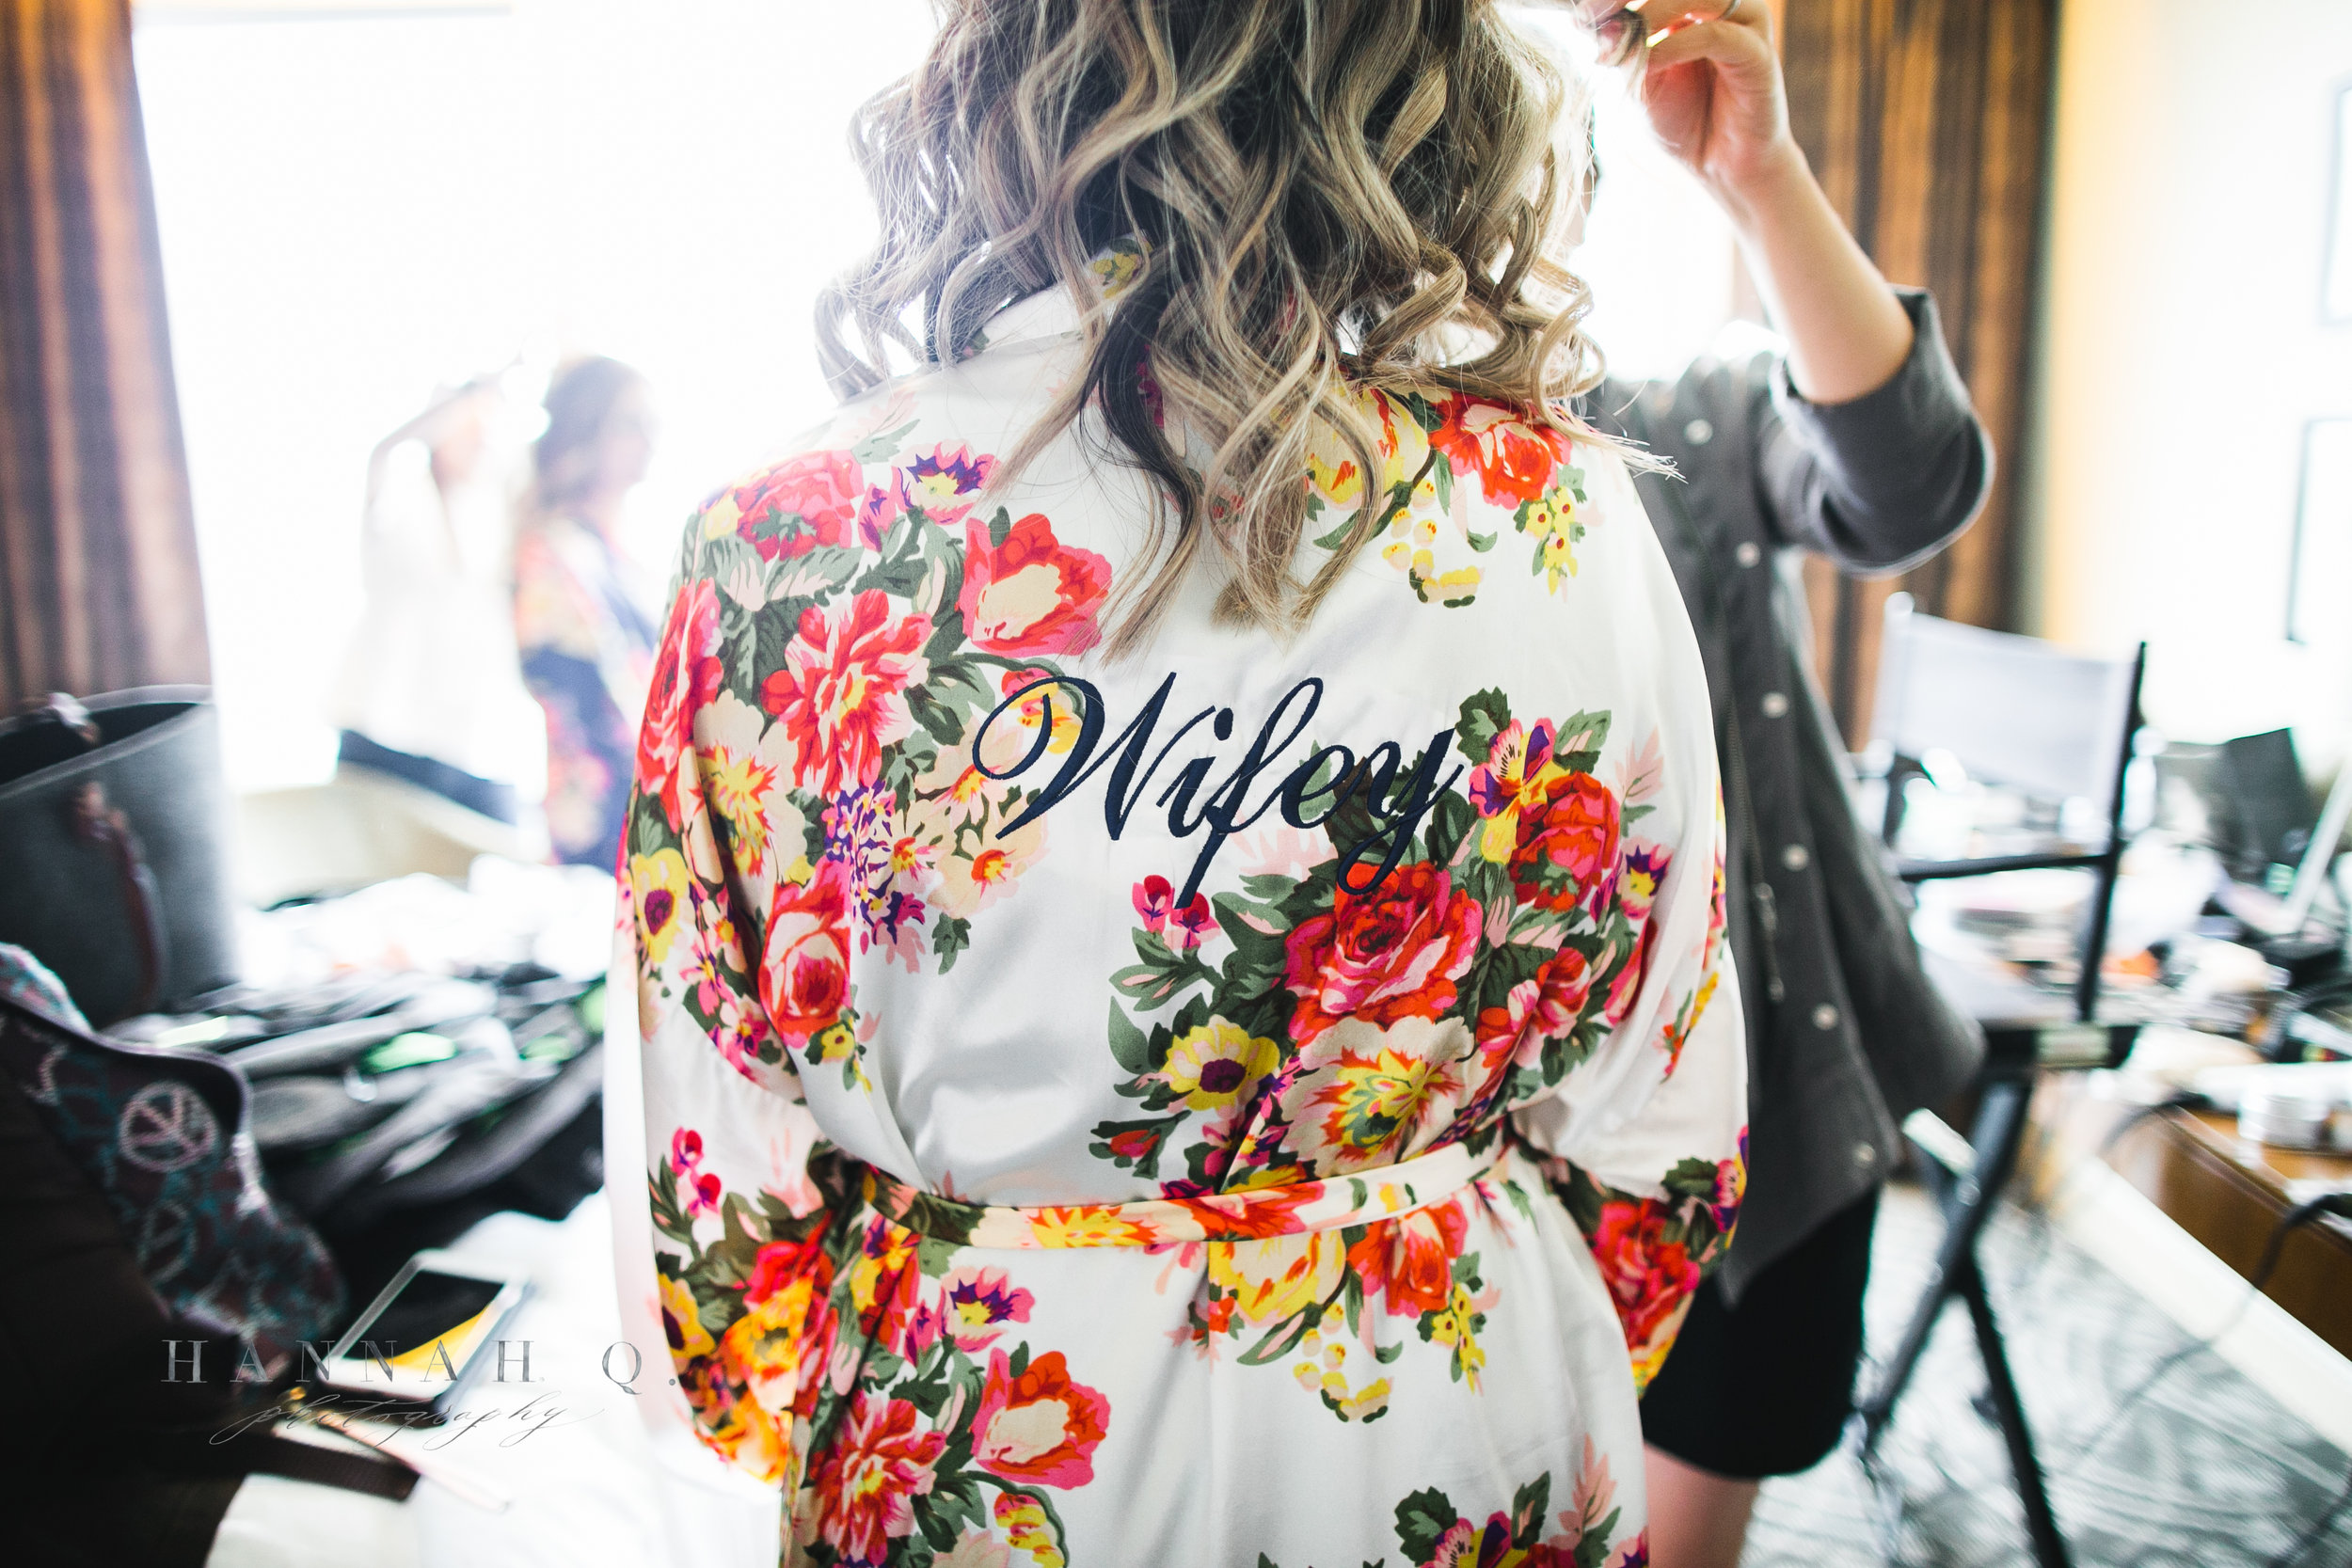 Love their floral robes <3